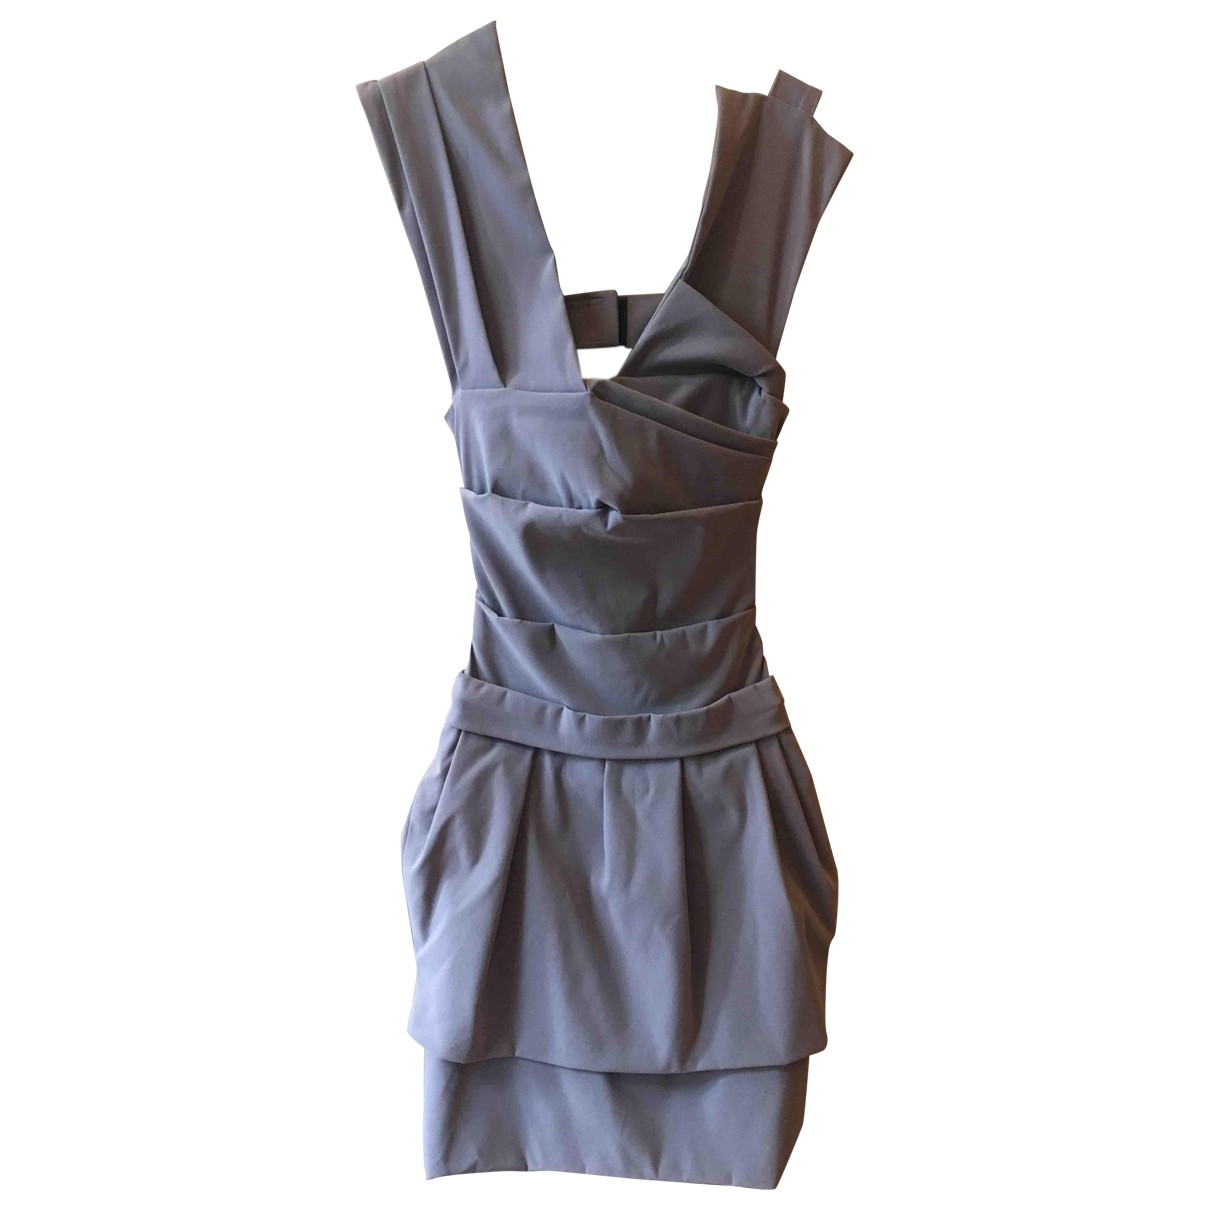 Preen By Thornton Bregazzi \N Grey Cotton dress for Women 6 UK